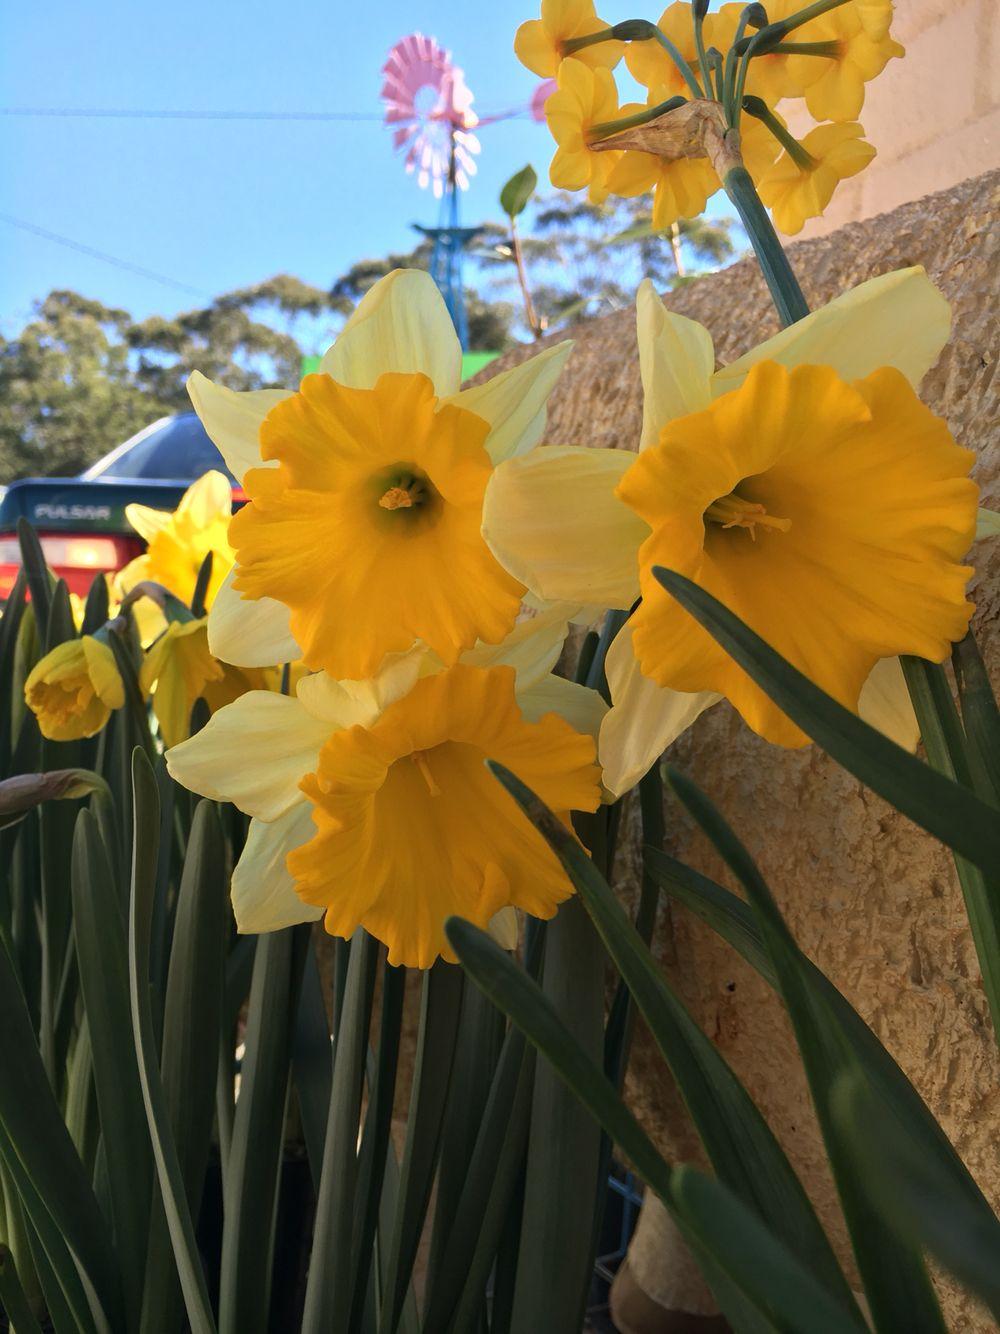 Stunning money maker daffodils flowering now!